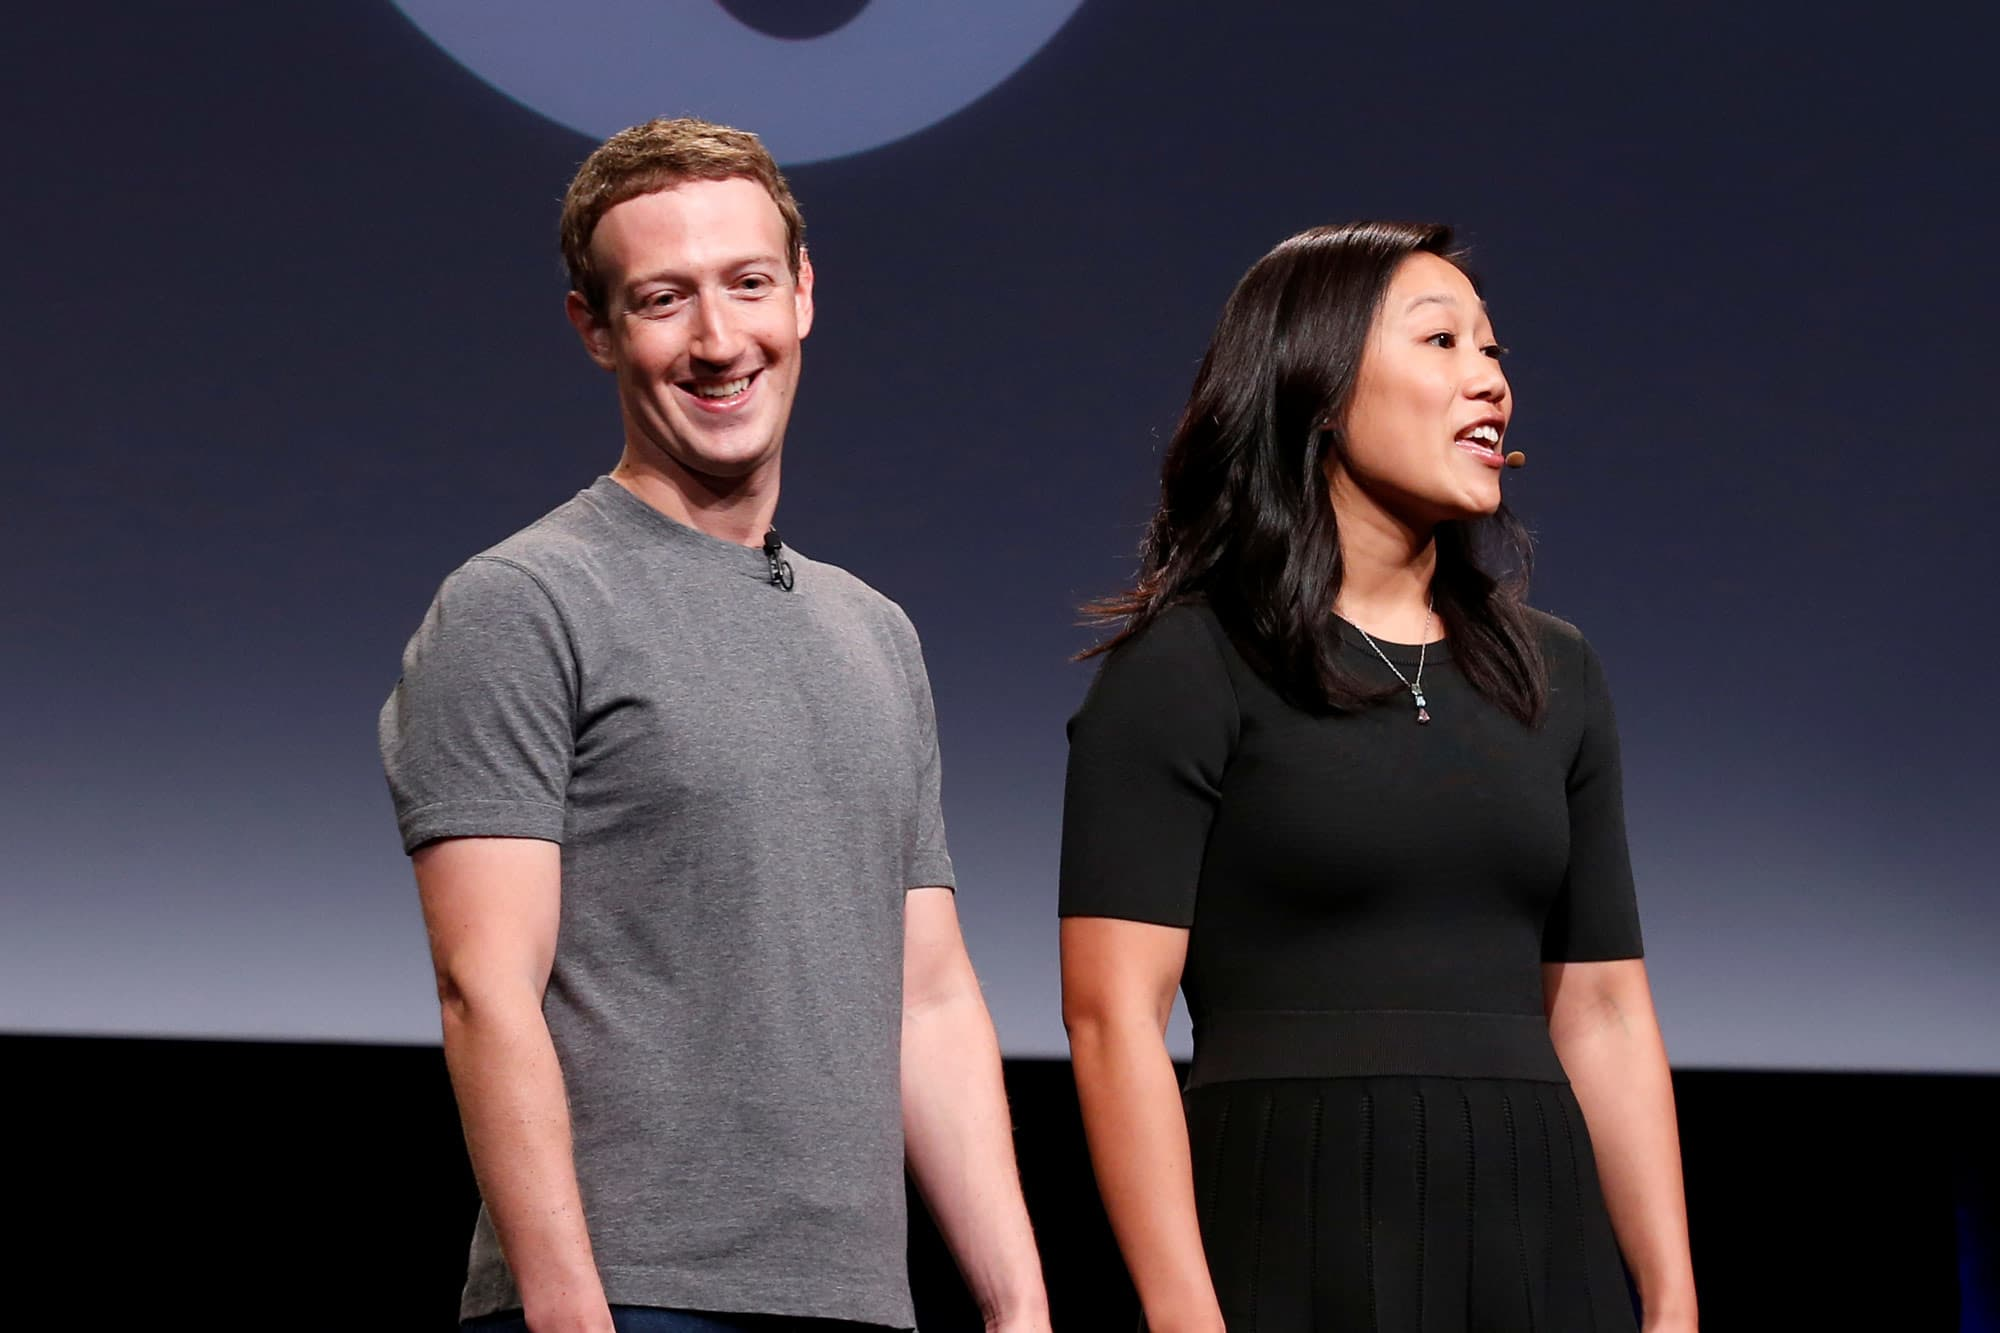 Mark Zuckerberg to his newborn daughter: 'We're optimists'